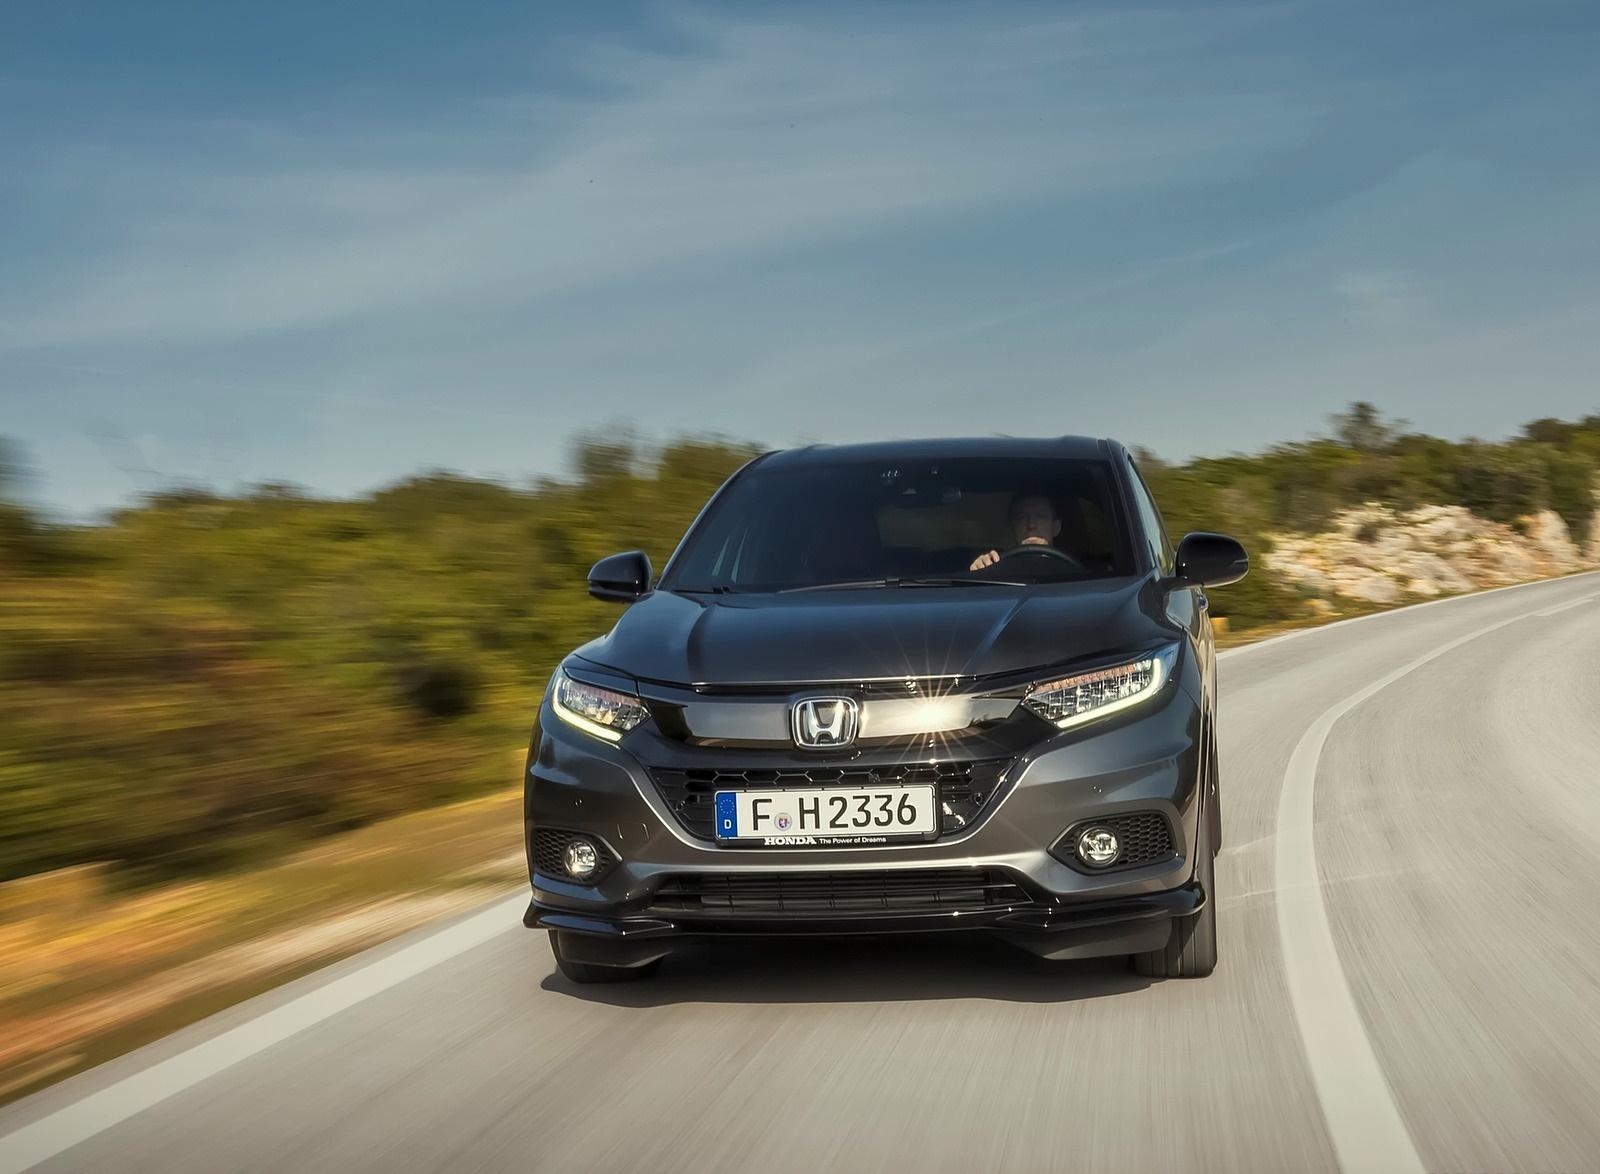 2019 Honda HR-V Front Wallpapers (10)